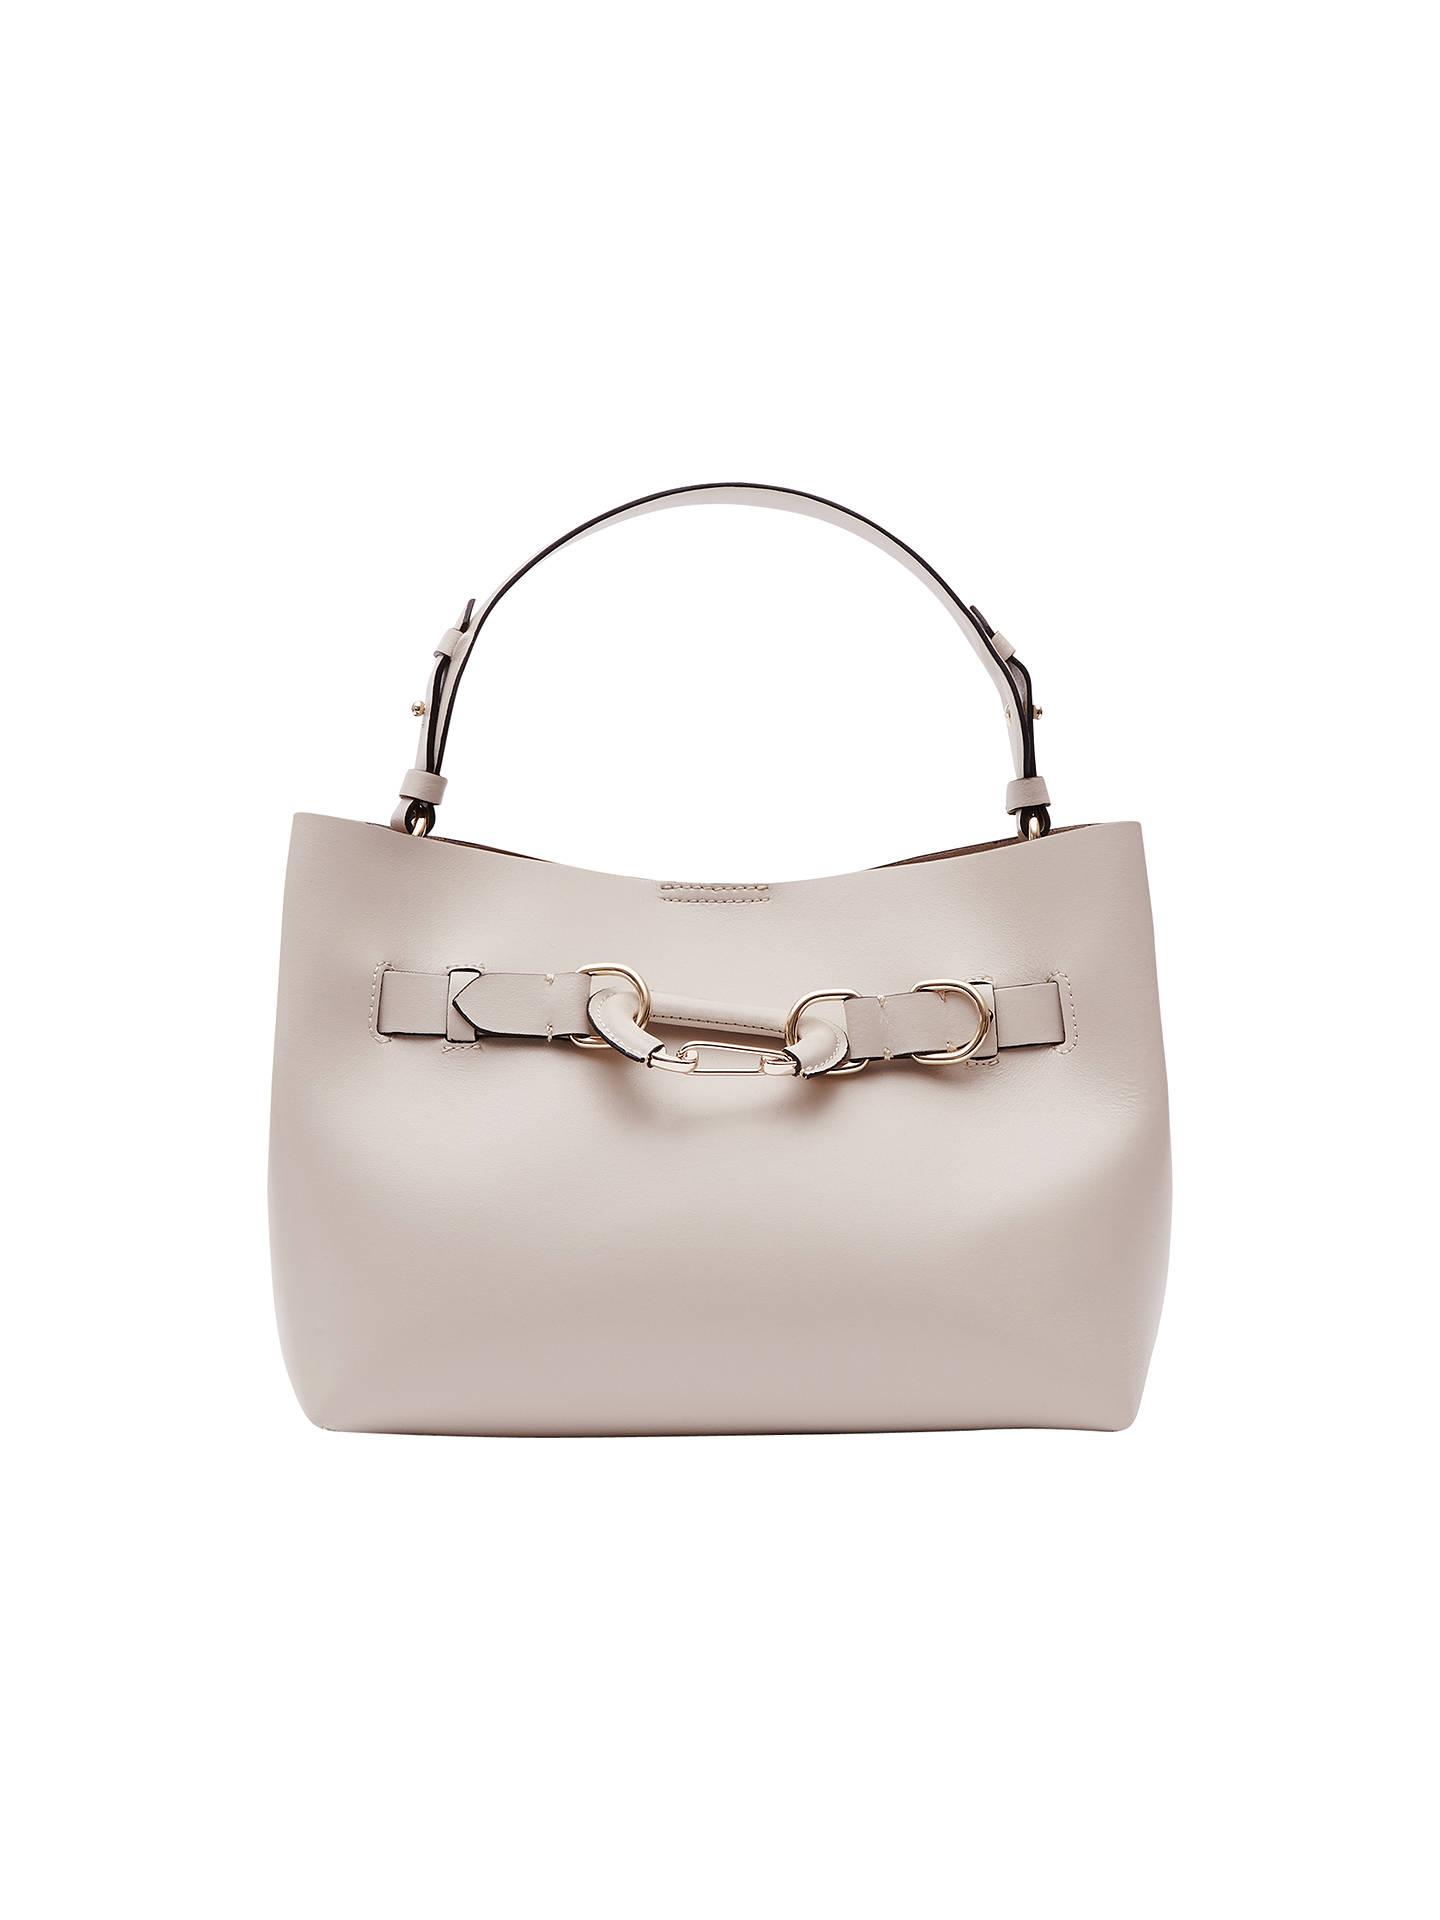 8ffe2186316d Buy Reiss Bleecker Hardware Detail Small Tote Bag, Cream Online at  johnlewis.com ...